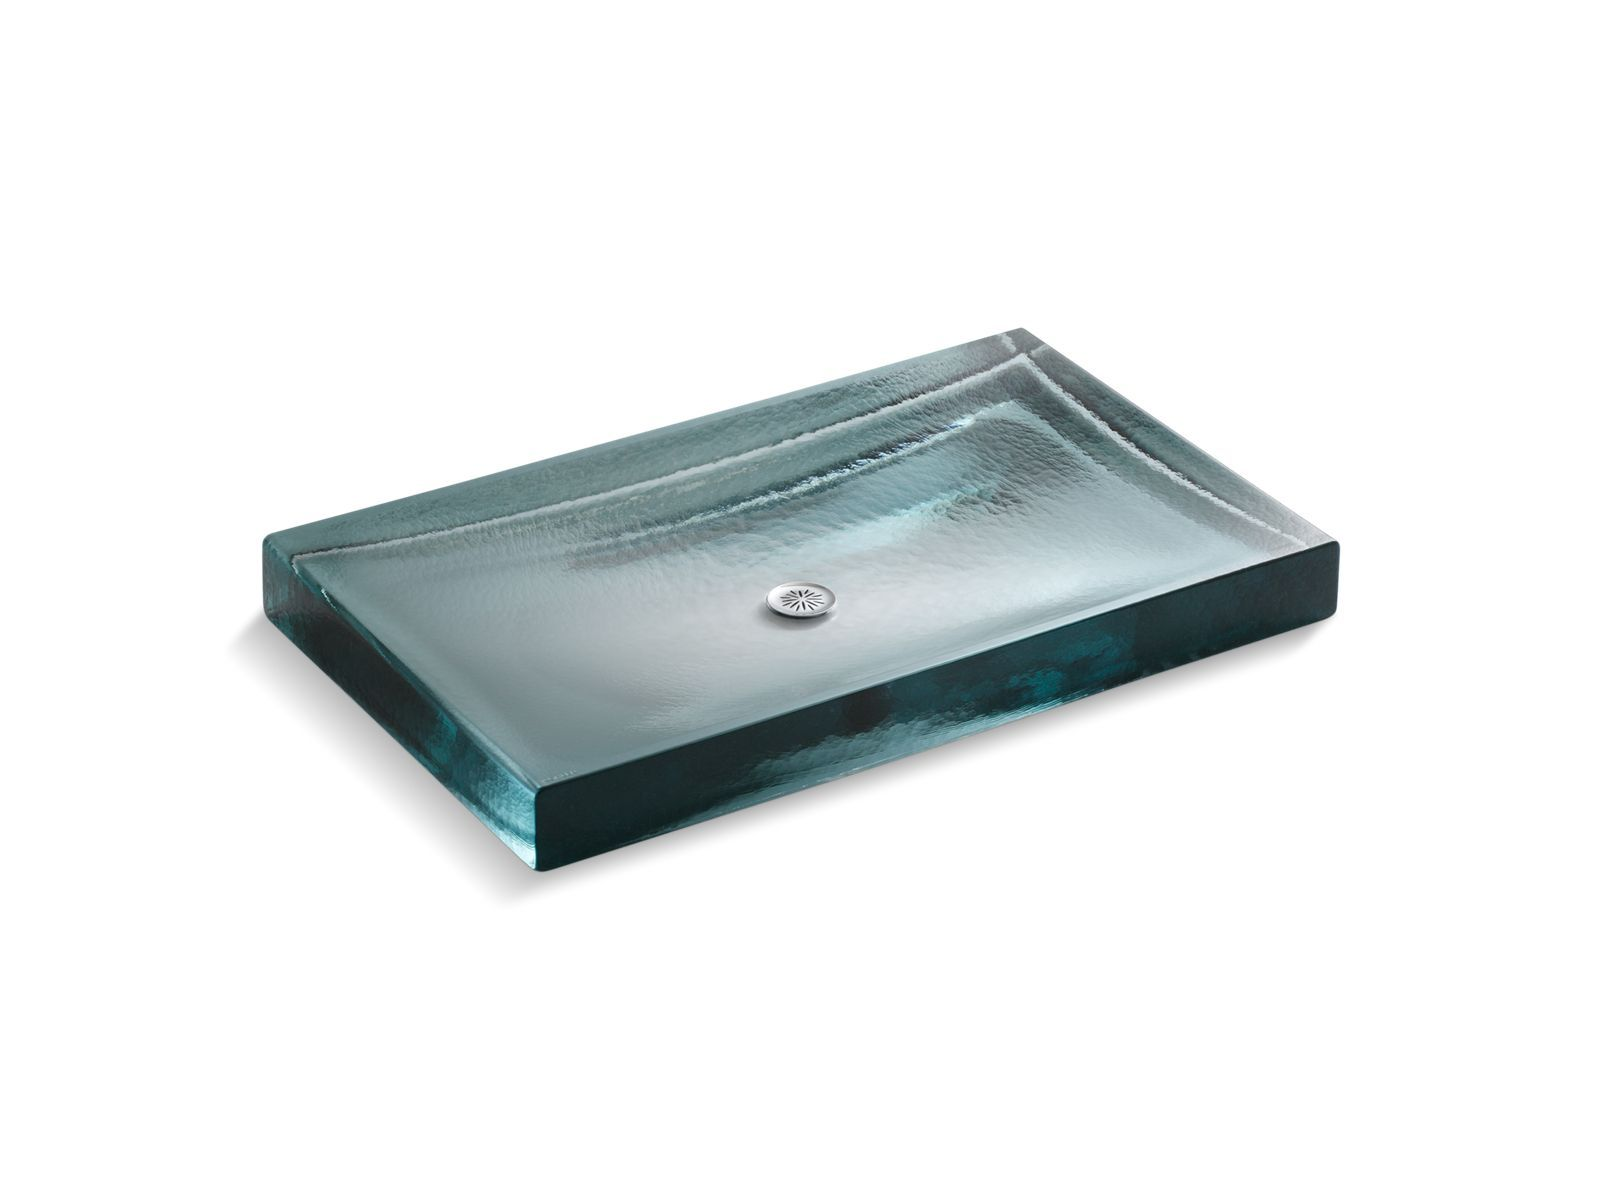 K 2369 Antilia Wading Pool Glass Sink Kohler Glass